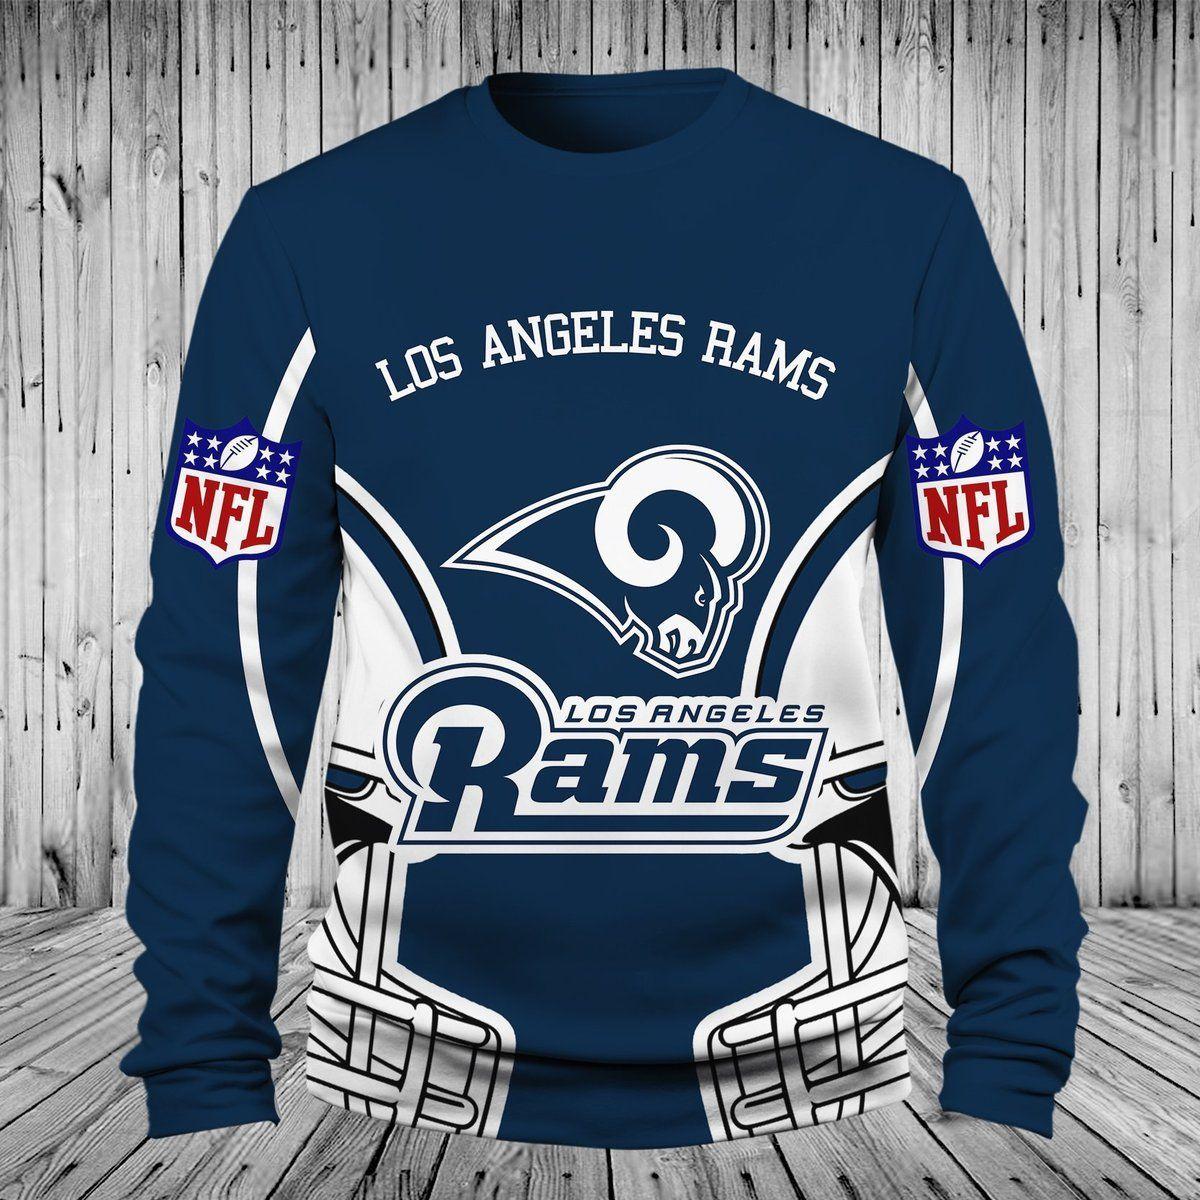 Men Women Los Angeles Rams 3d Sweatshirt Los Angeles Rams Sweatshirt Nfl Los Angeles Rams Apparel Mens Tops T Shirt Tops